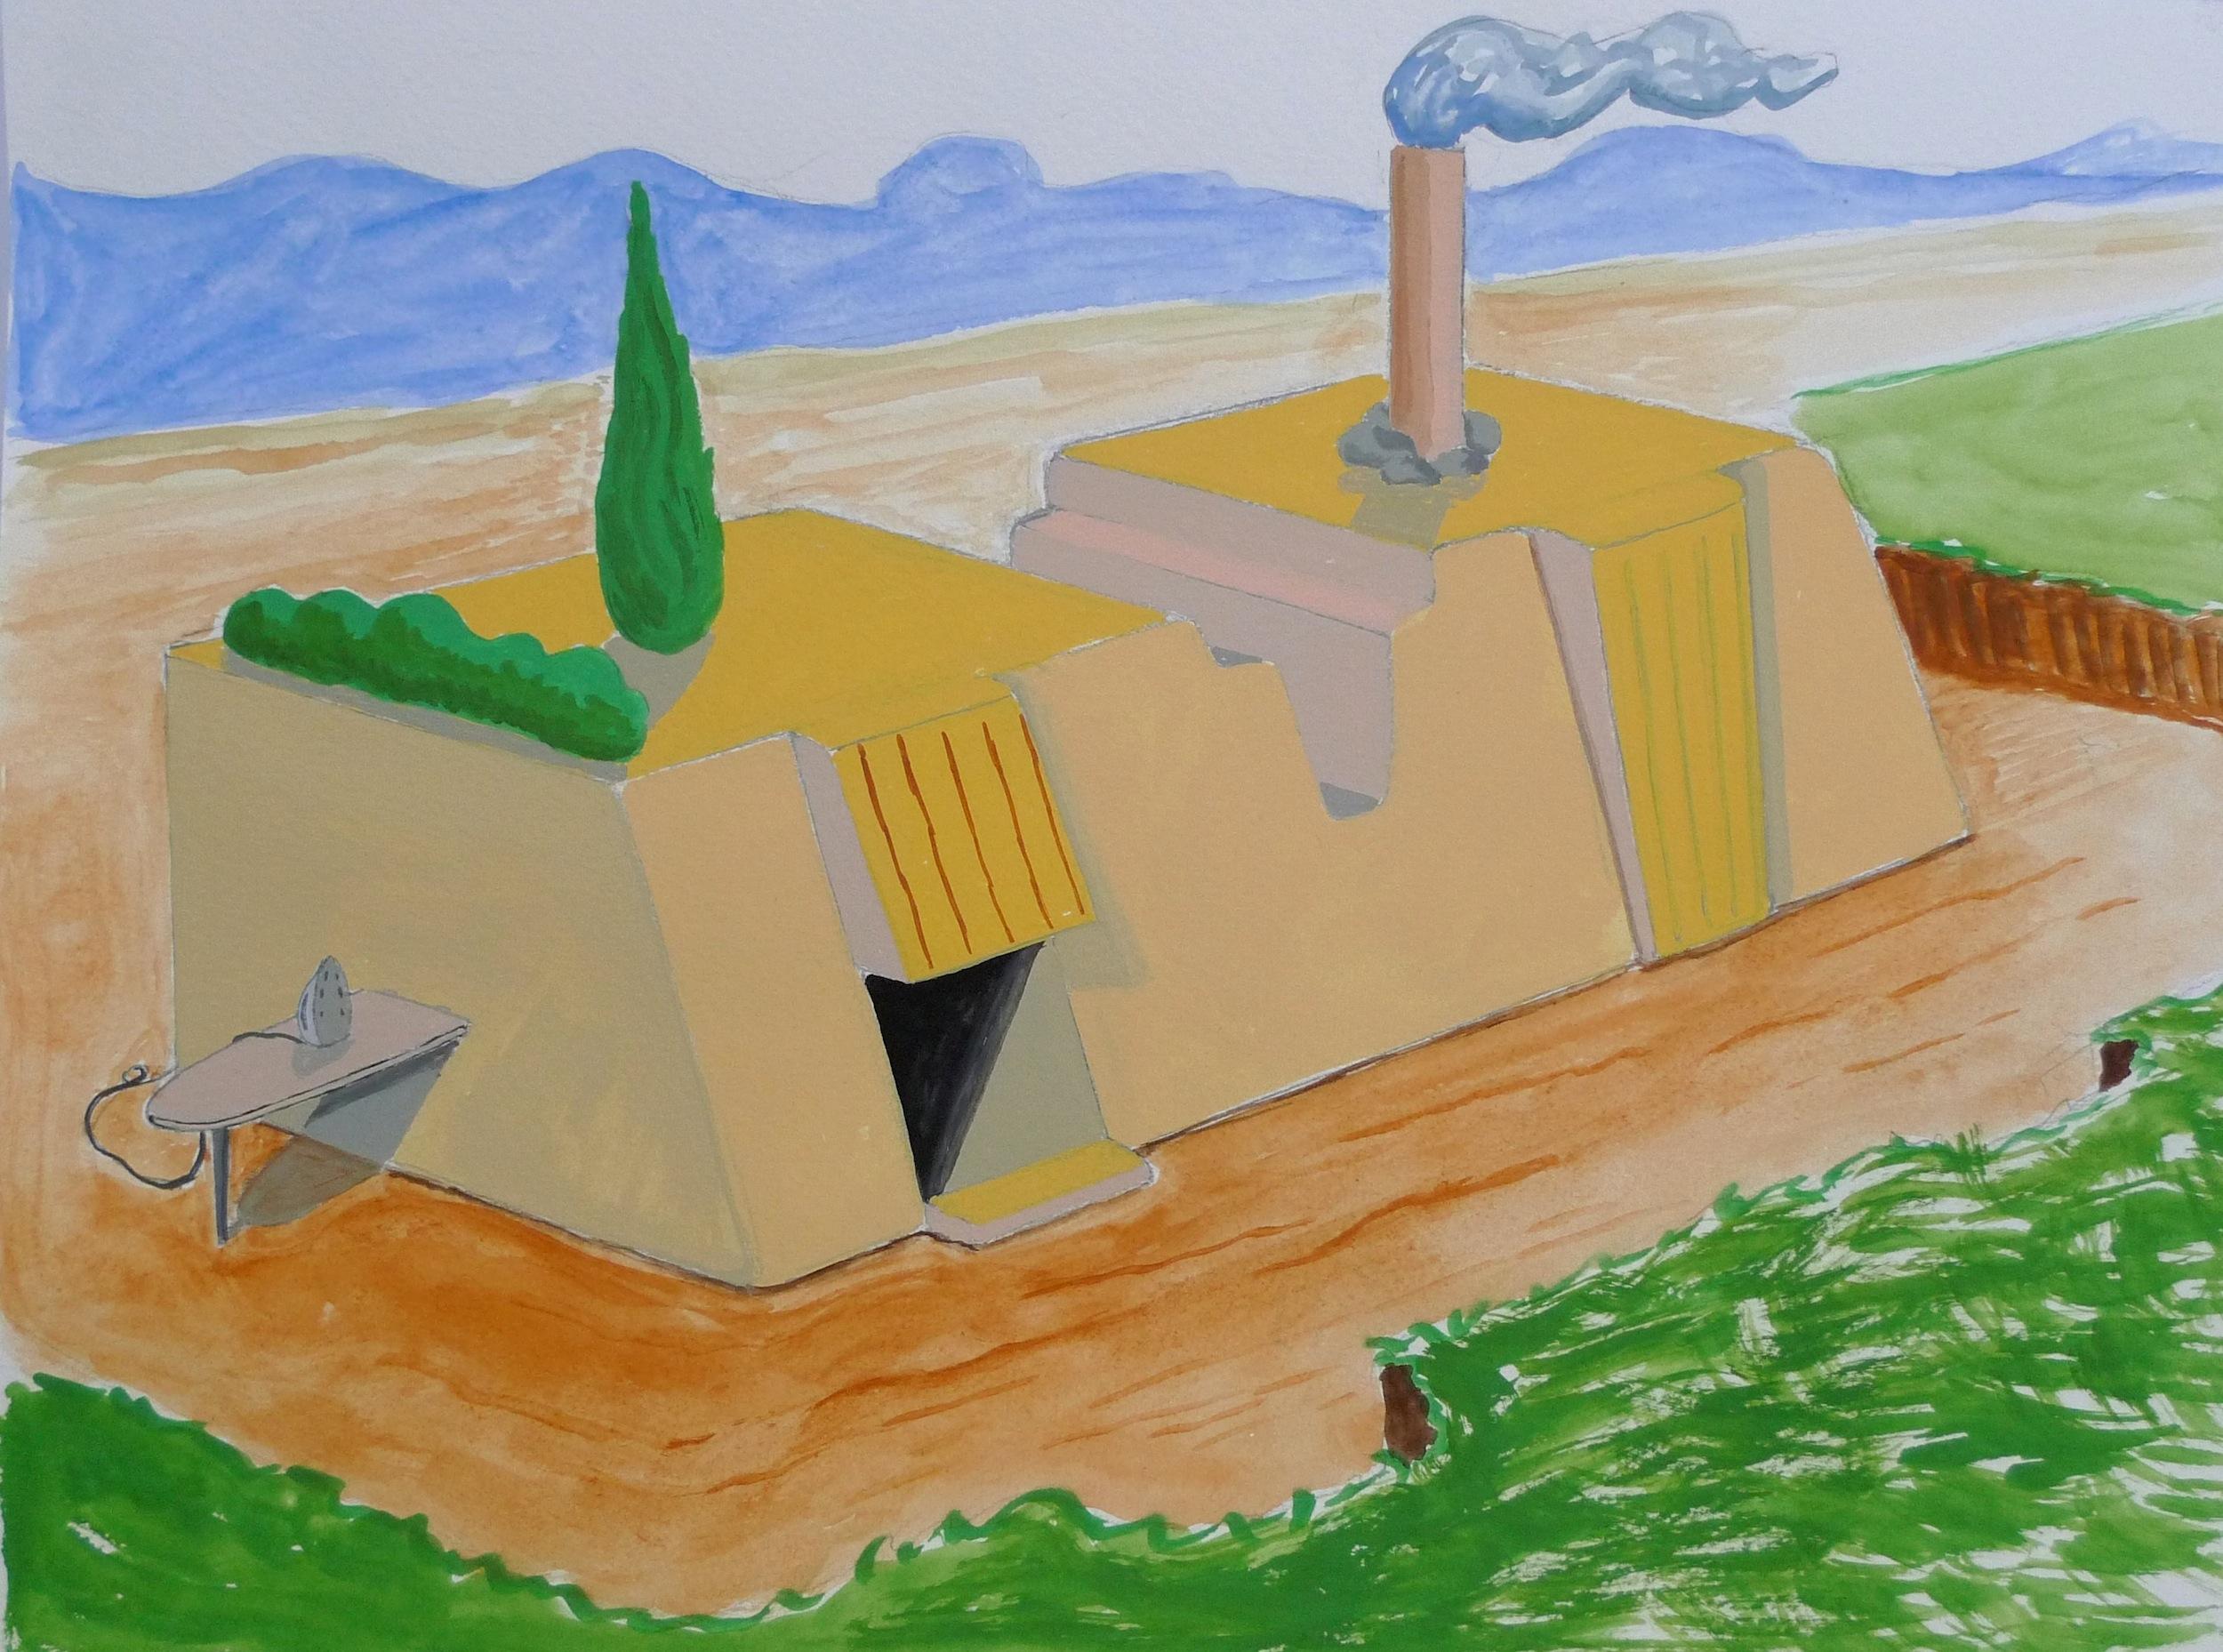 Study for a buliding  2016 Gouache on paper, 24 x 32 cm